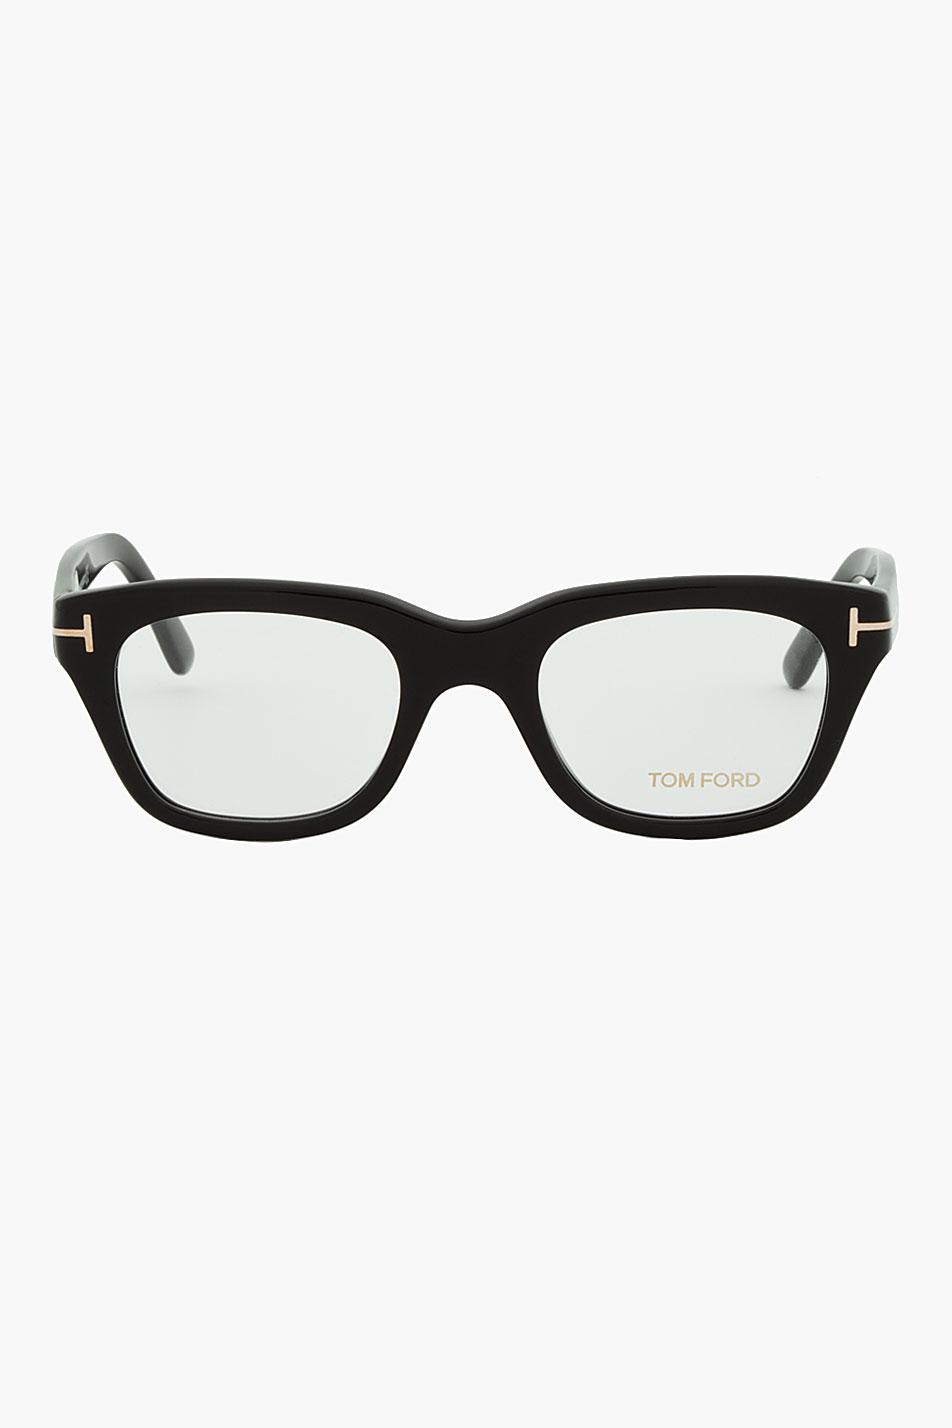 Thick Black Frame Prescription Glasses : Tom ford Black Thick Frame Cat Eye Glasses in Black for ...